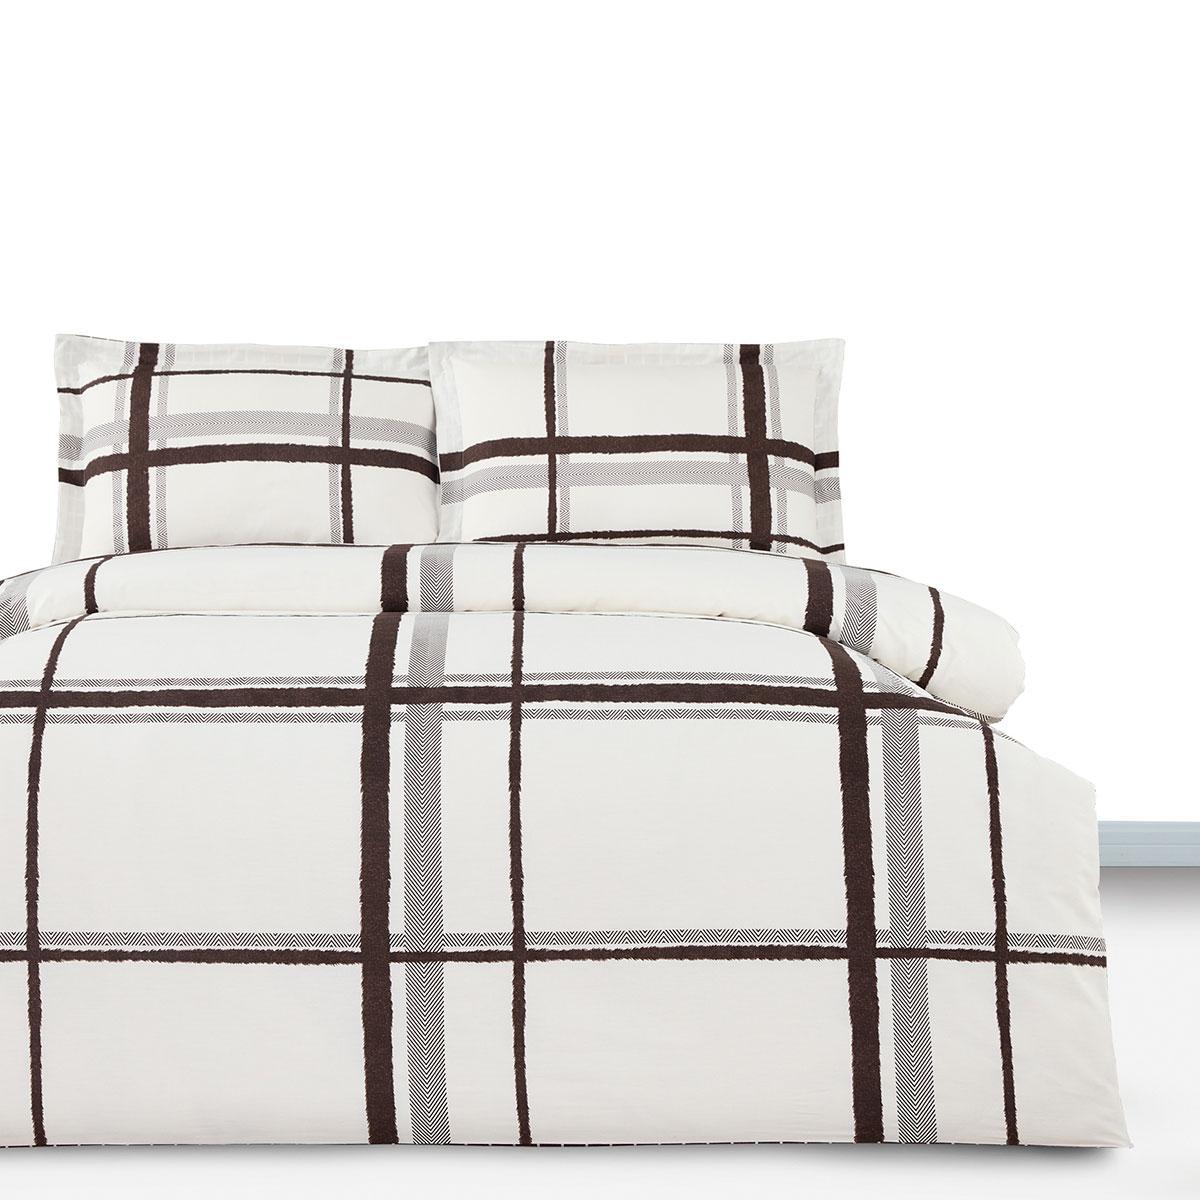 Постільна білизна сімейне Arya Simple Living Afra AR-A107005 сатин 160х220х2 см